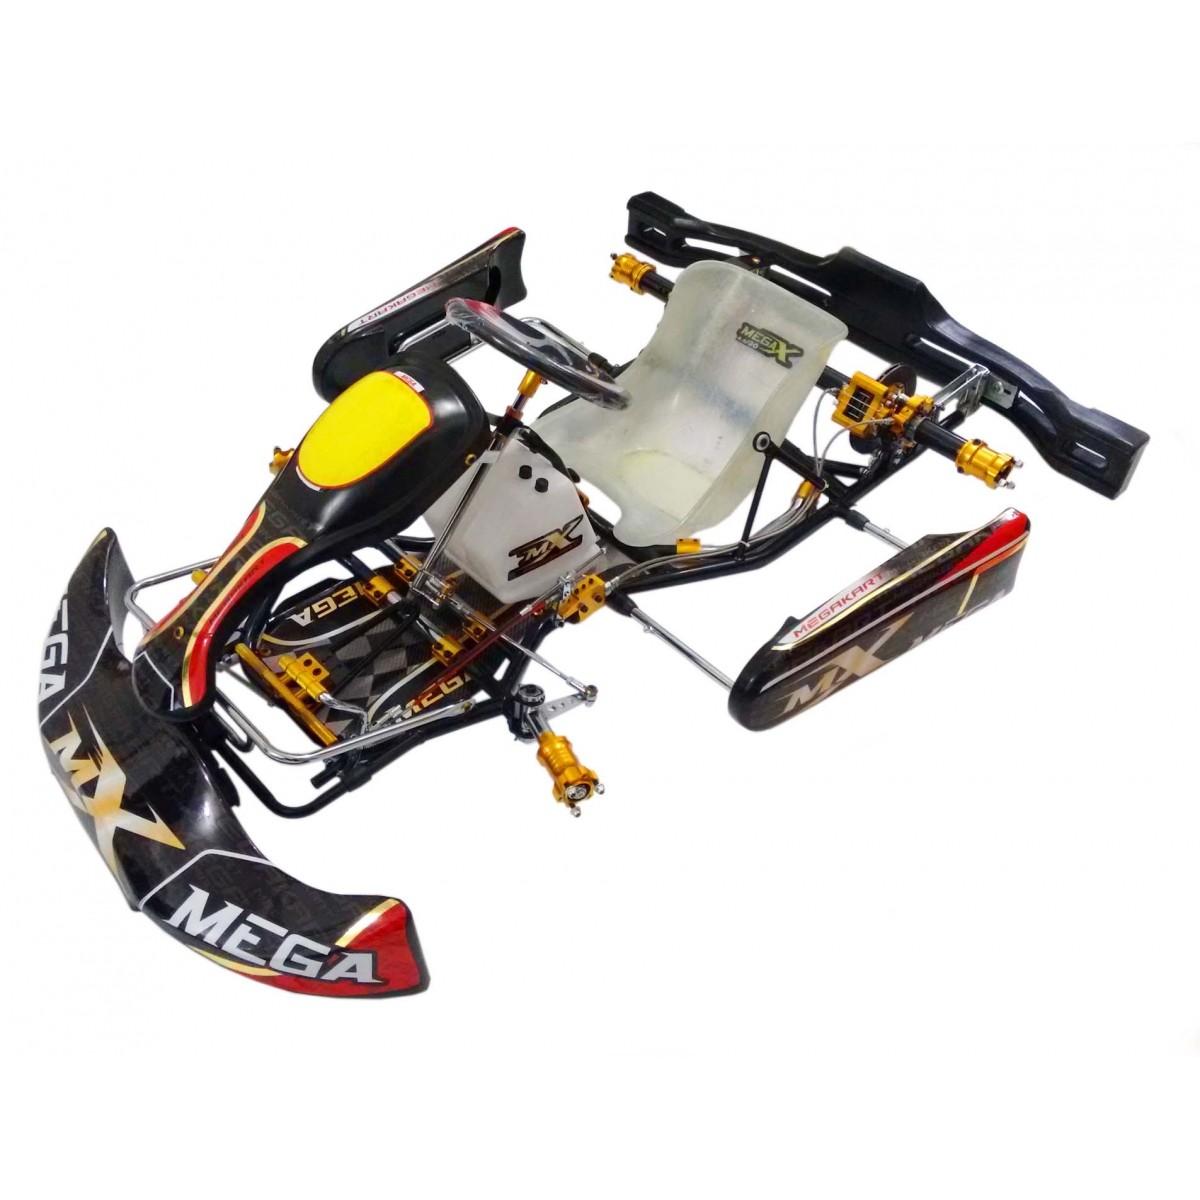 Kart Black Gold Shiffter  - 858